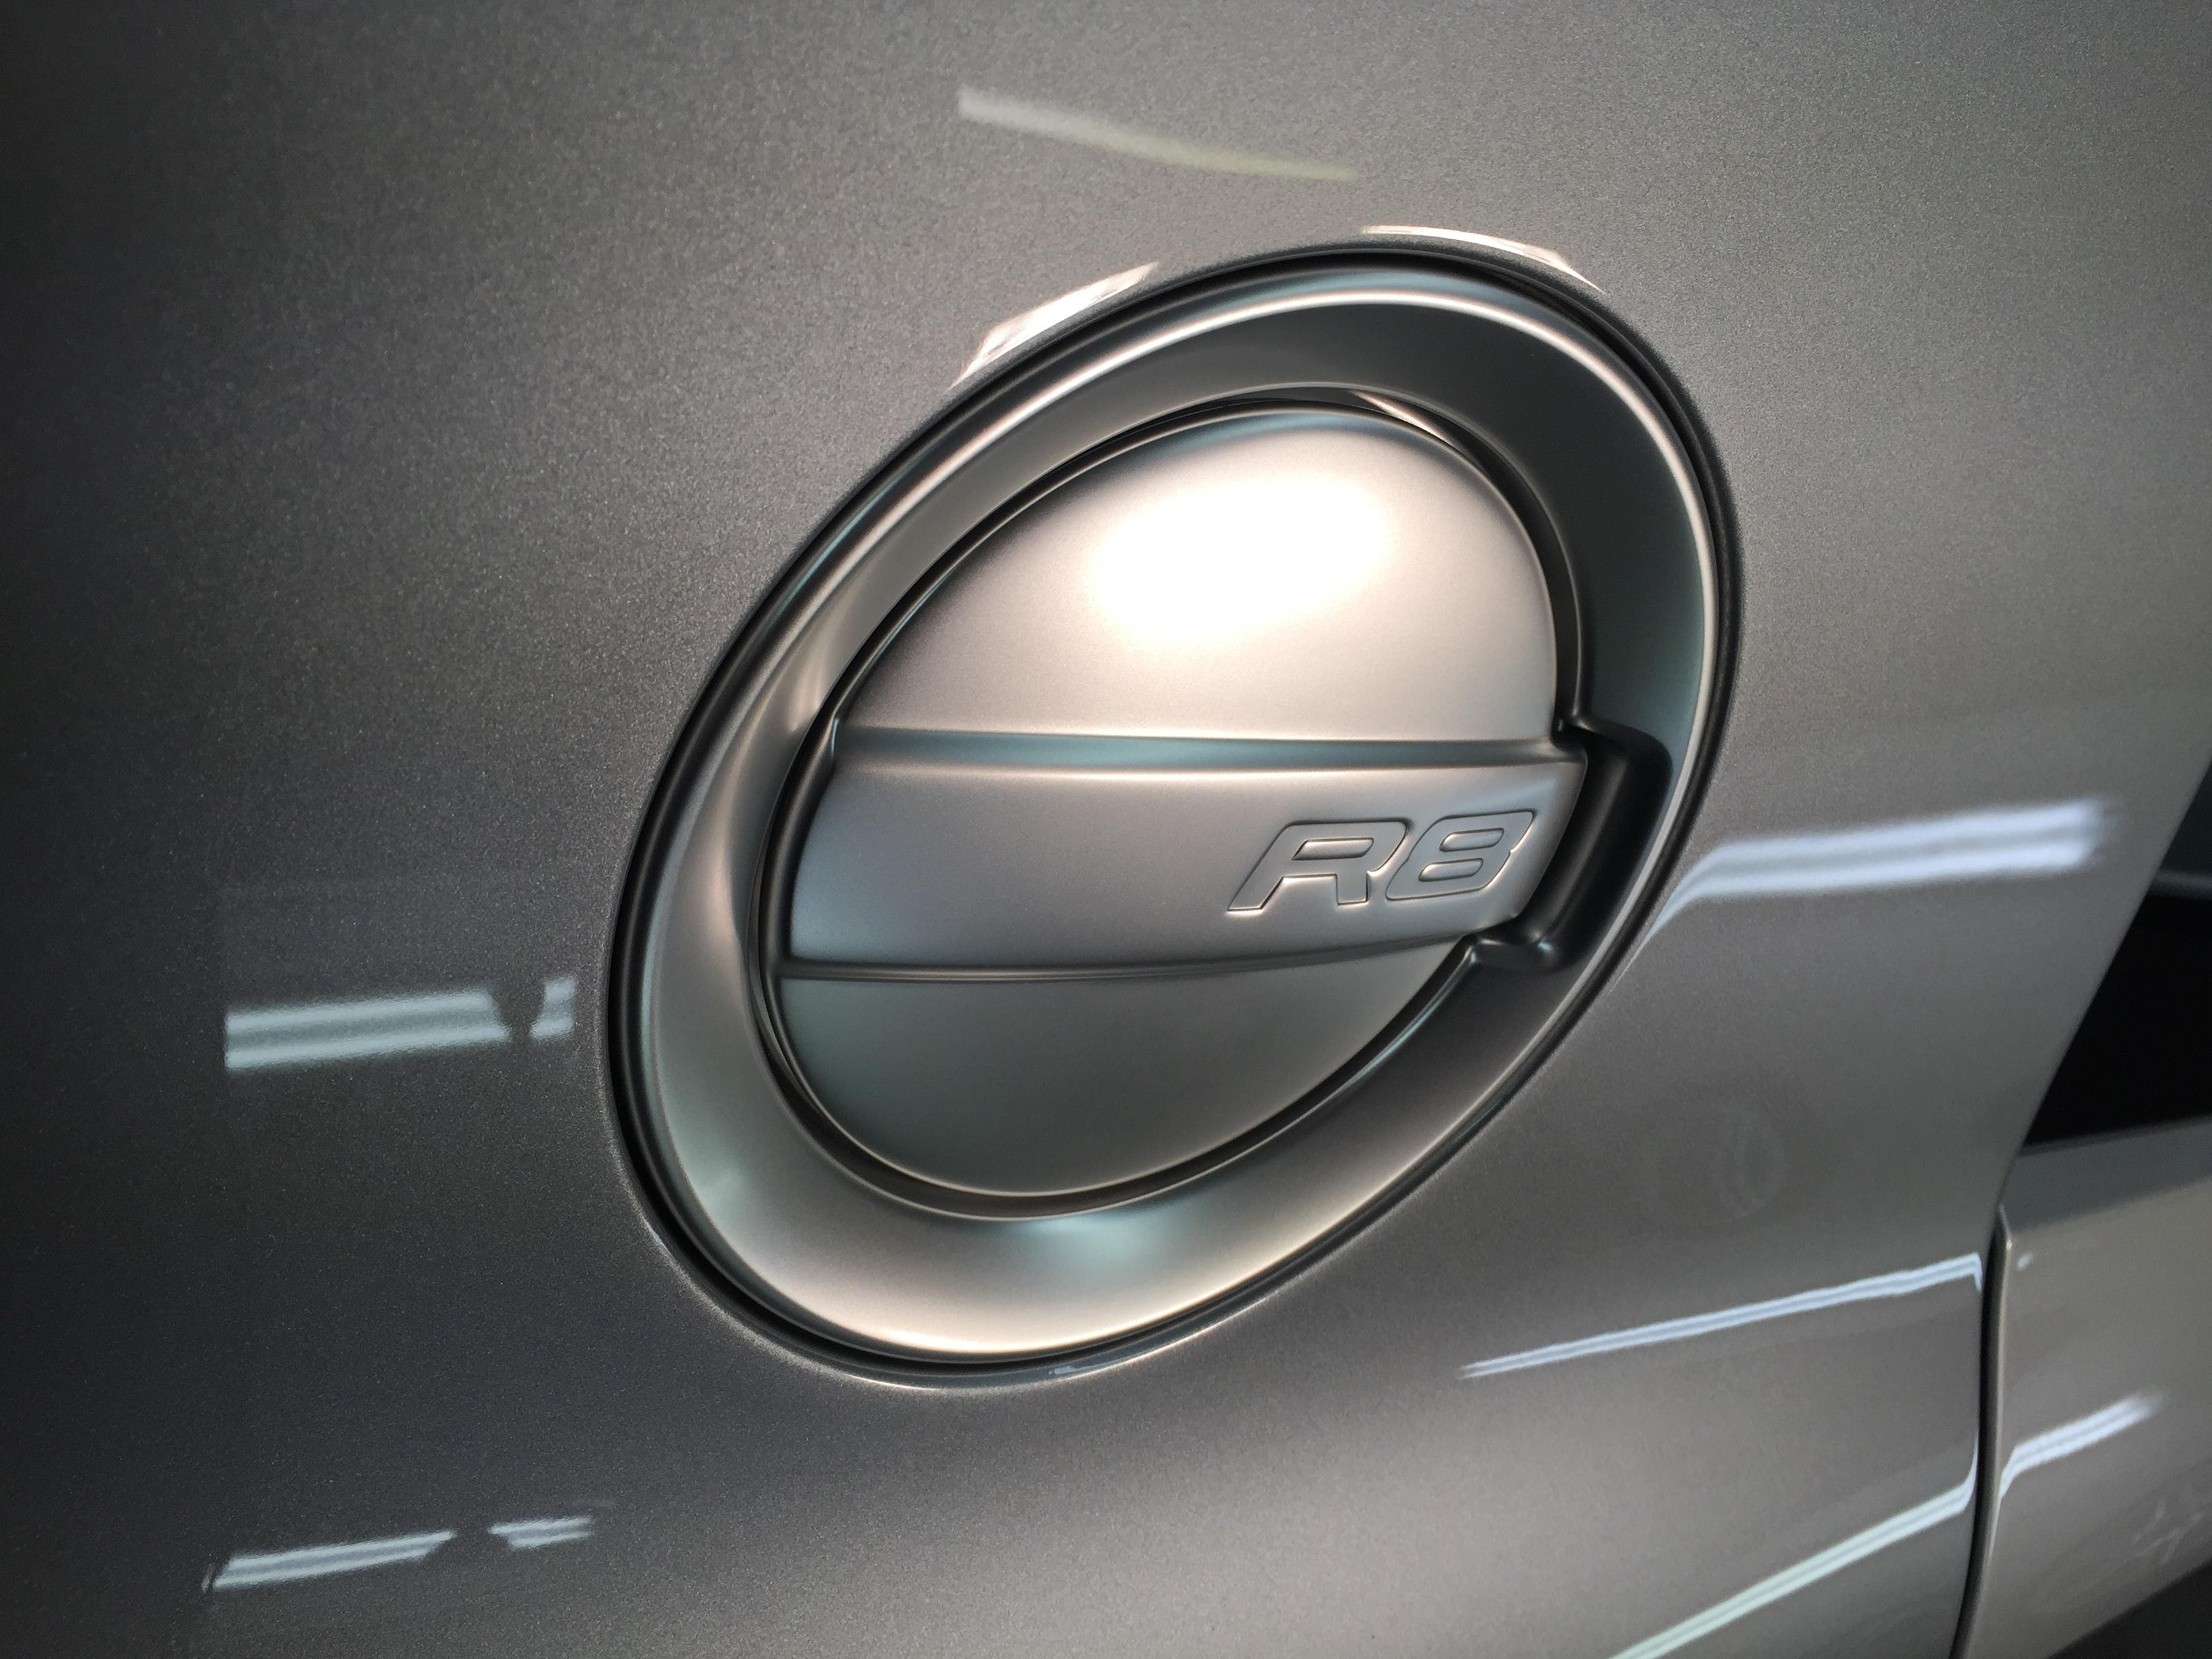 R8 Fuel Cap